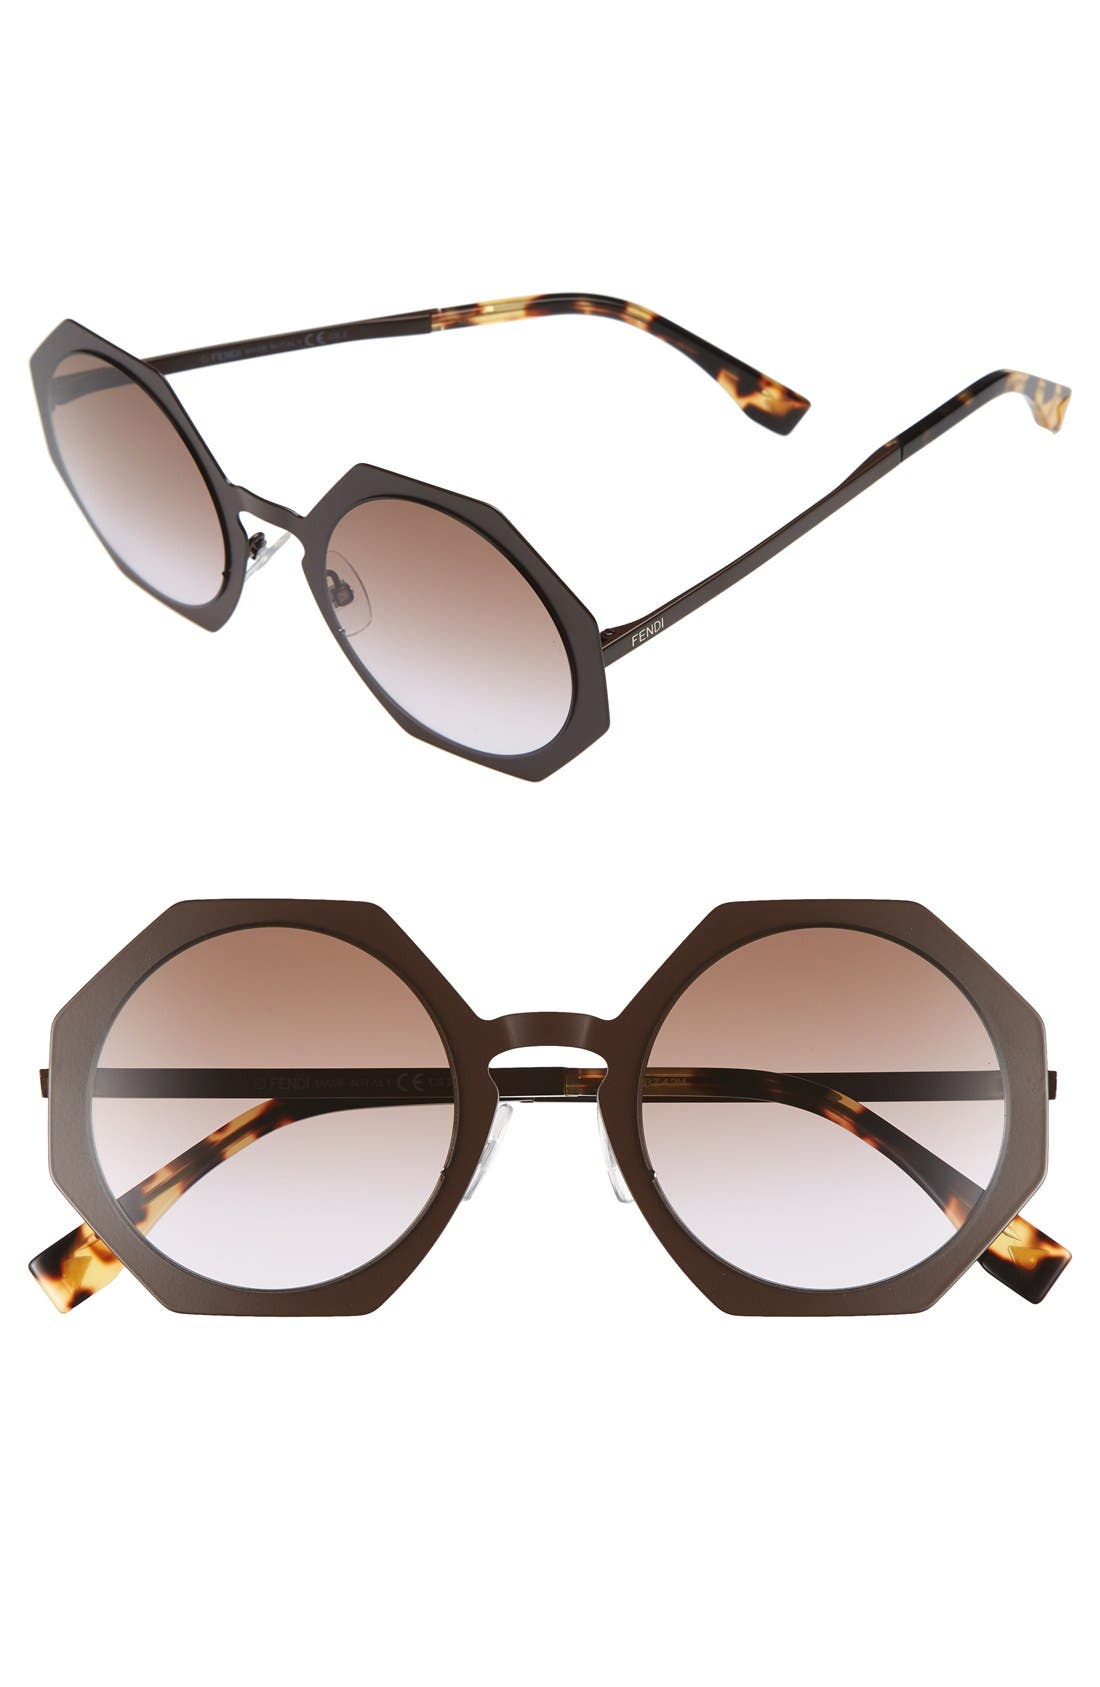 51mm Retro Octagon Sunglasses,                         Main,                         color, Brown